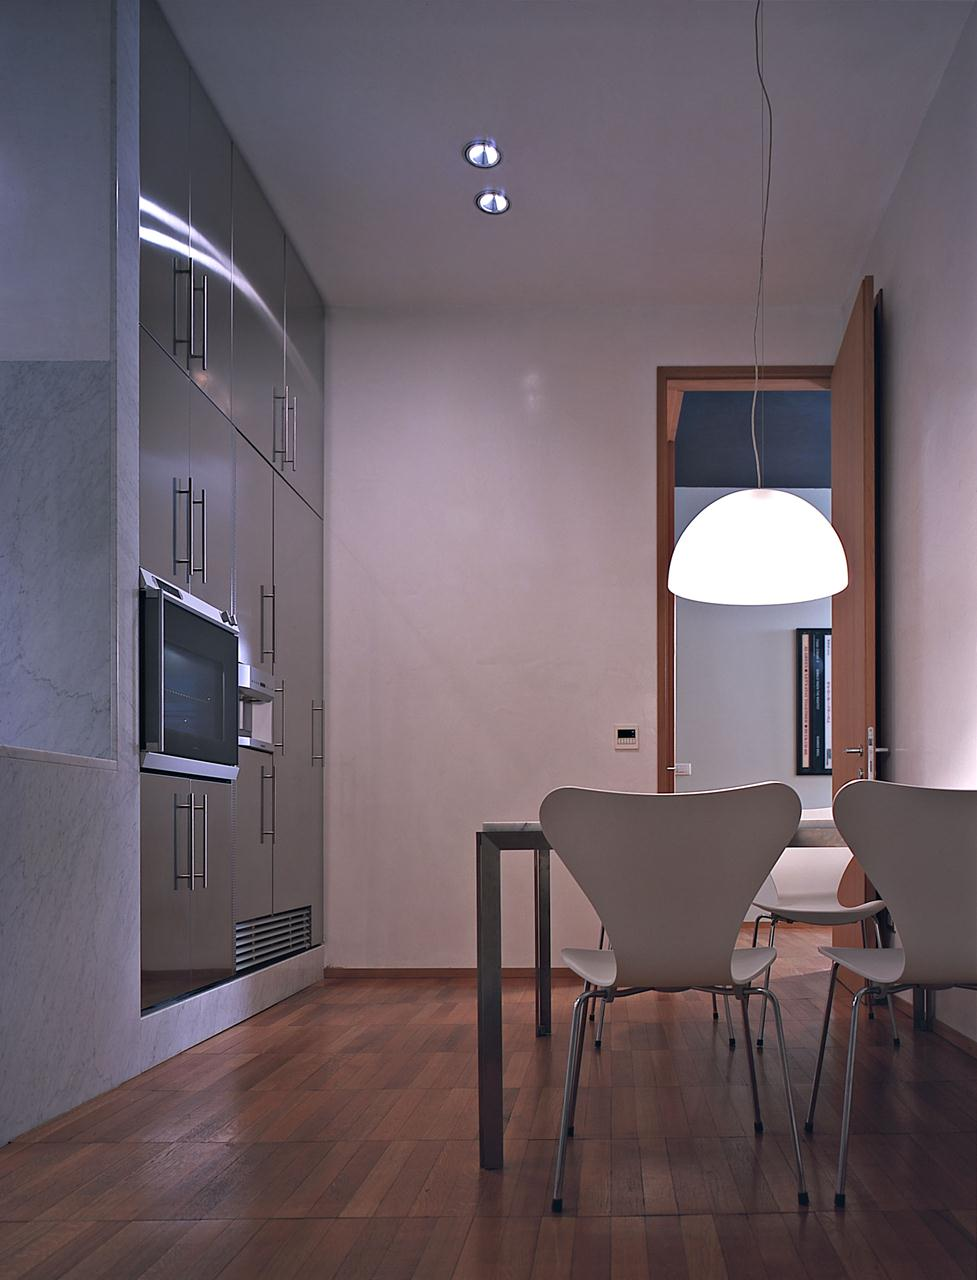 http://www.antoniolazzaretto.it/wp-content/uploads/2013/10/20-588-16.jpg